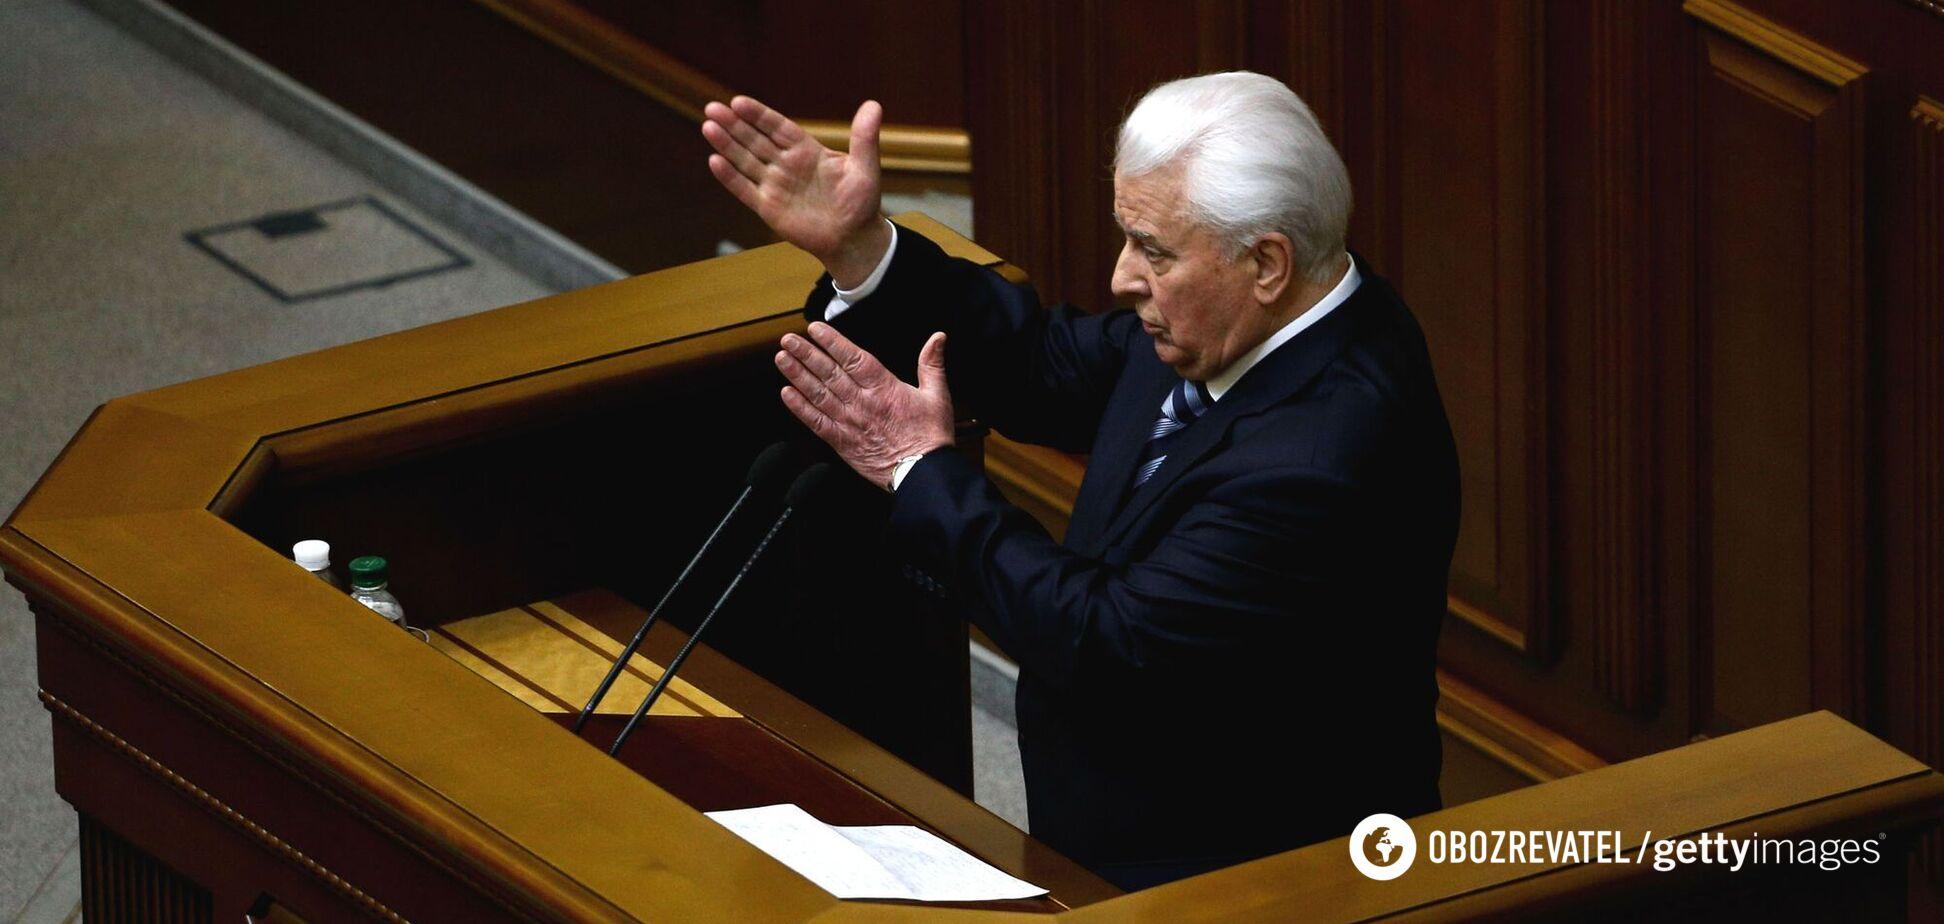 Кравчук во главе ТКГ – это символично, – Стефанишина